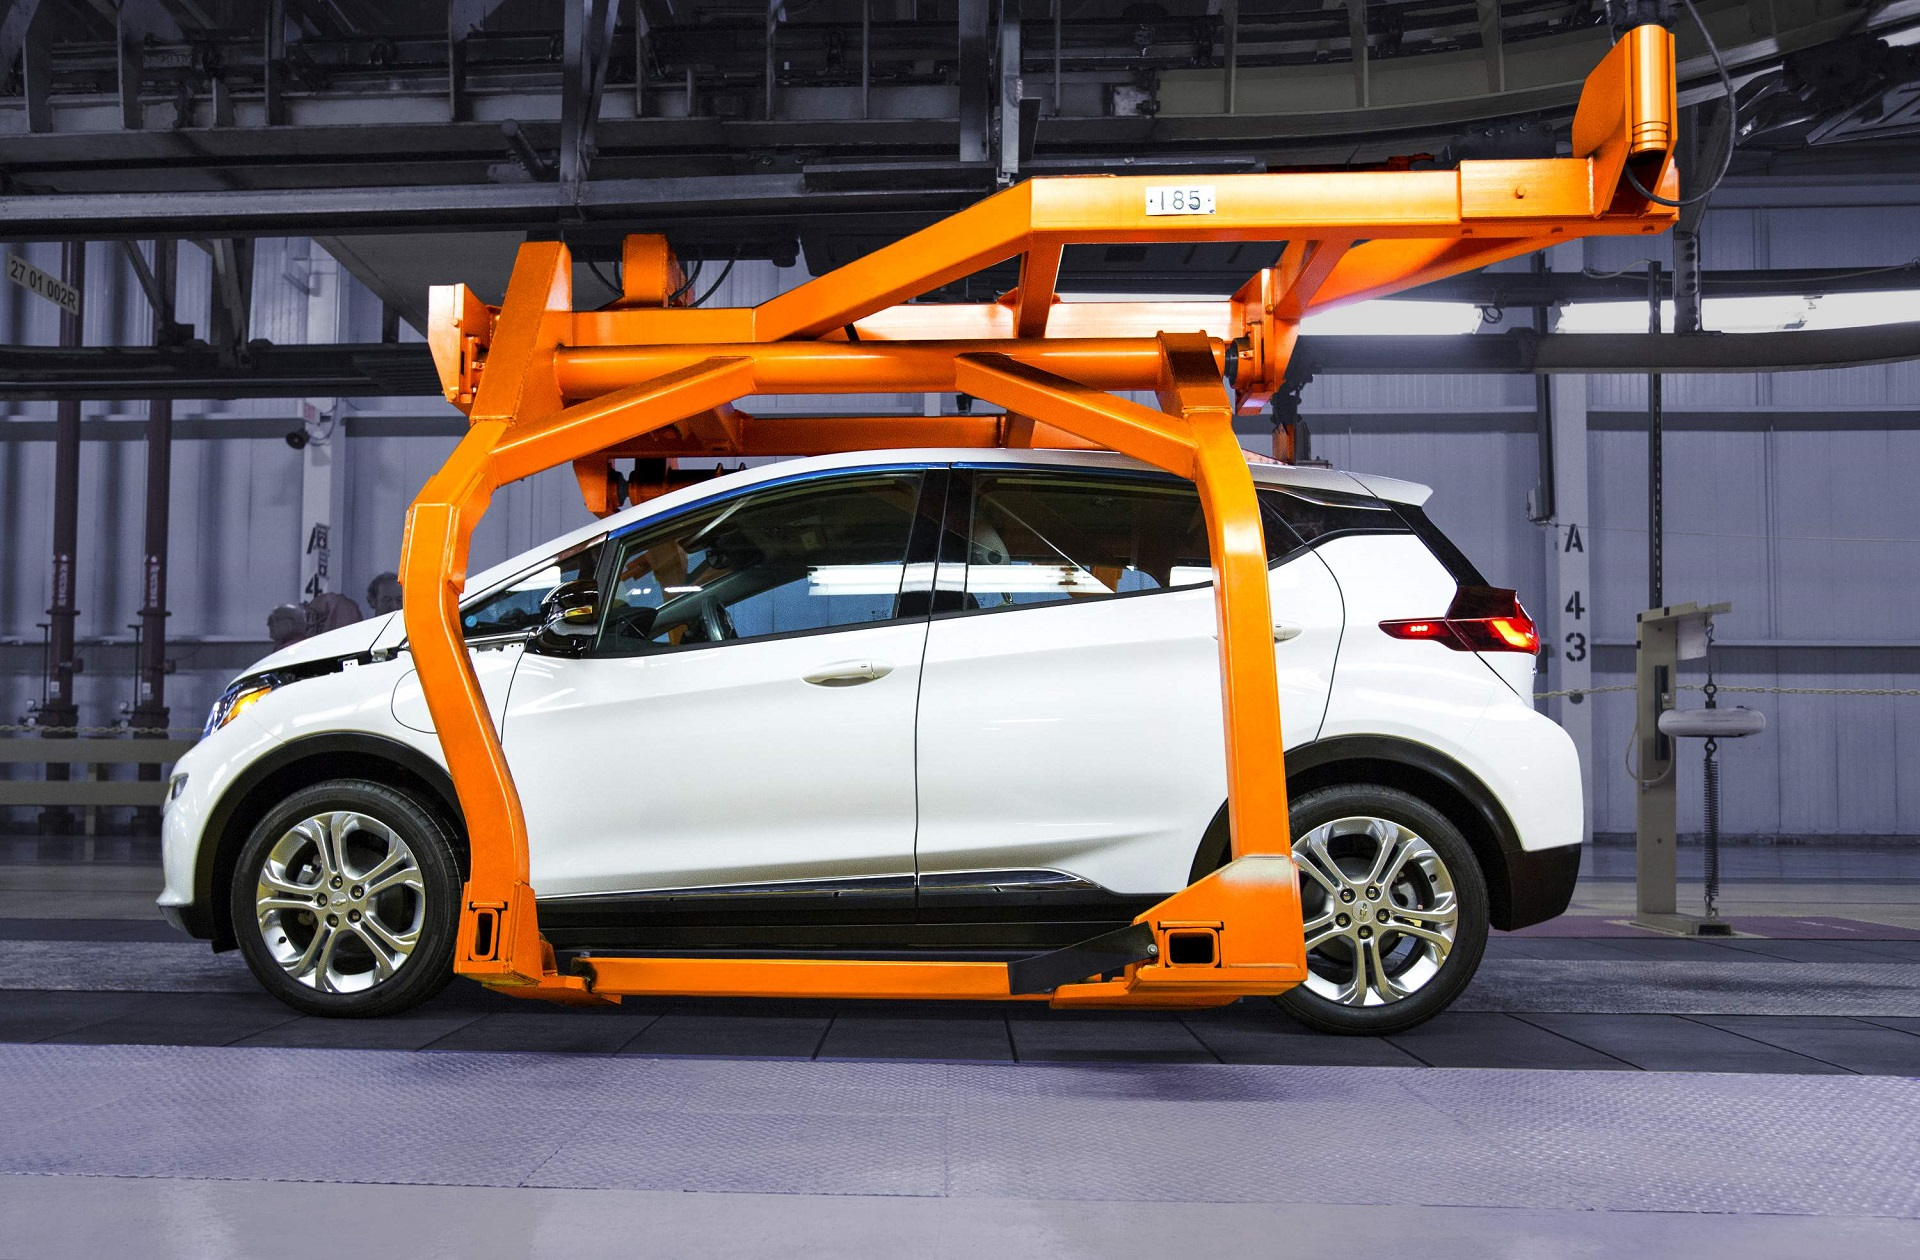 Chevy Bolt Ev Costs 28 700 To Build Tesla Model 3 A Bit Higher Ysis